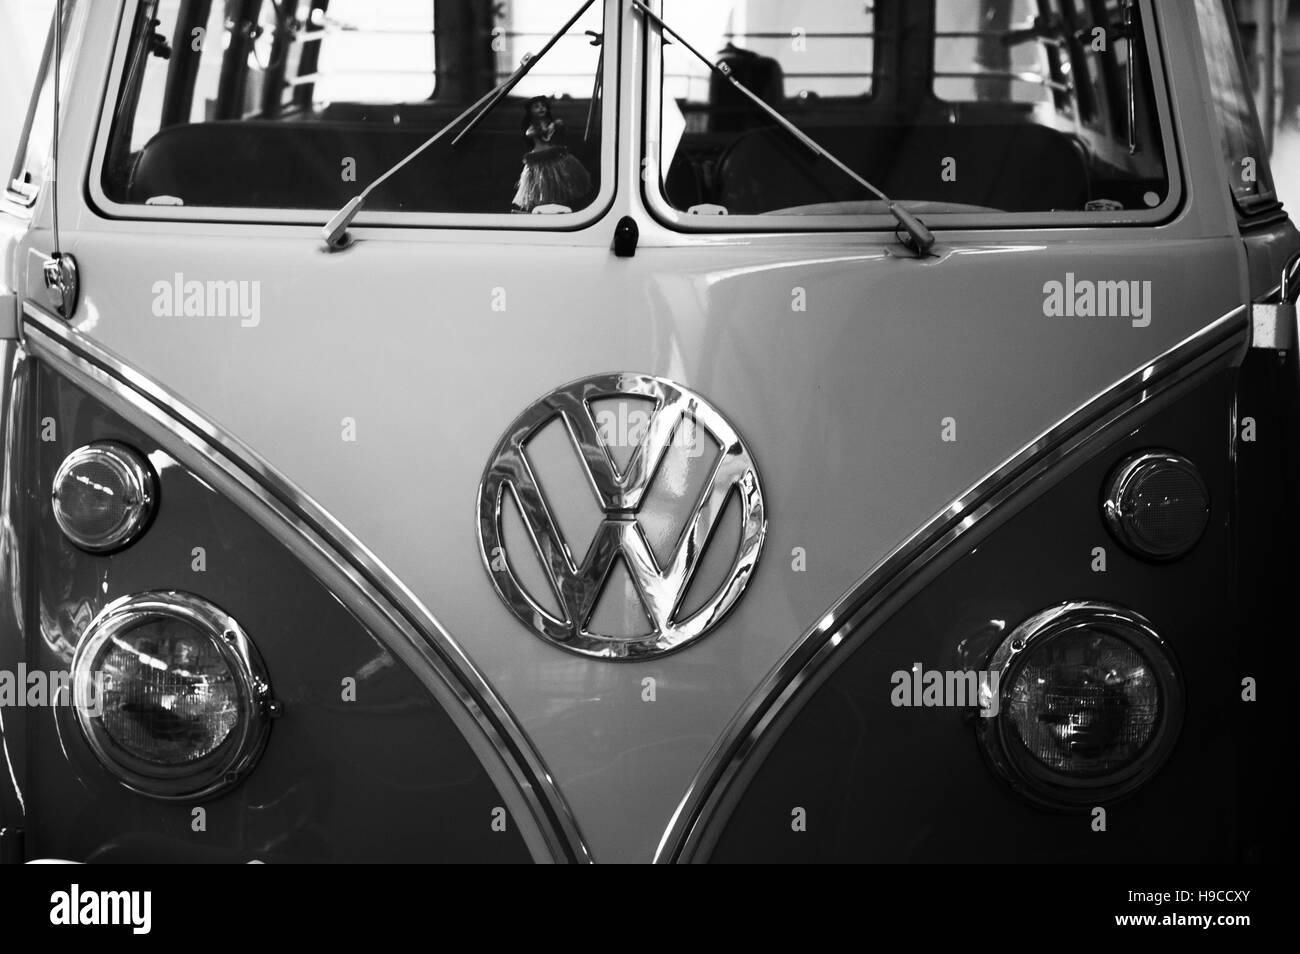 Photo Volkswagen Transporter, Year 1950-1975, Minibus 9 seats be, VW,   photo auto headlight, - Stock Image